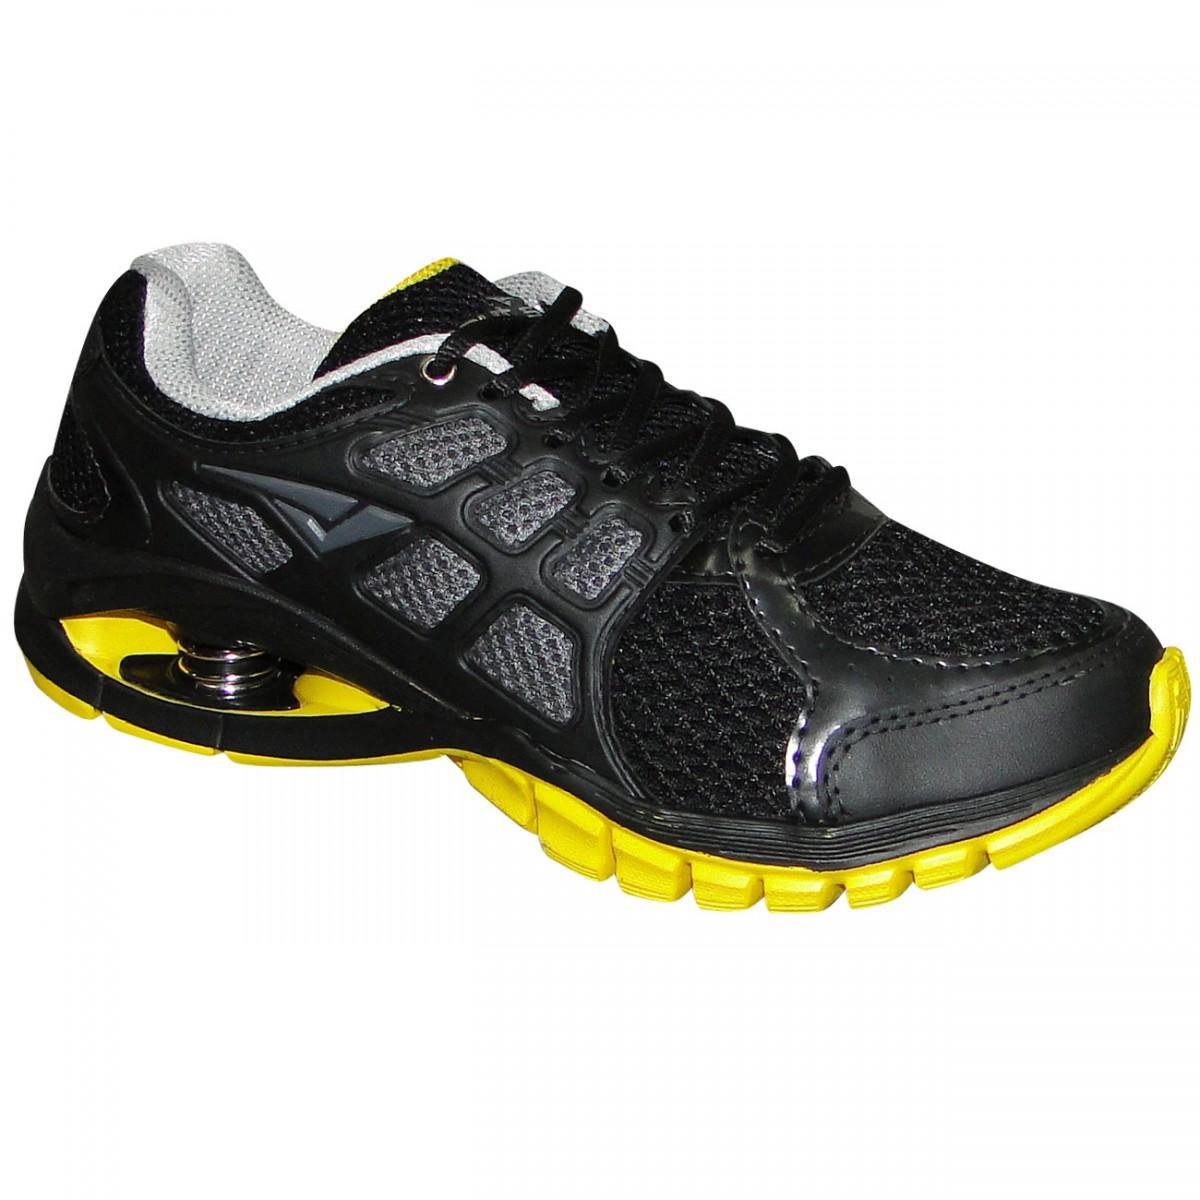 029c8be668b Tenis Bouts Ultra 9036BS-316 - Preto Amarelo - Chuteira Nike